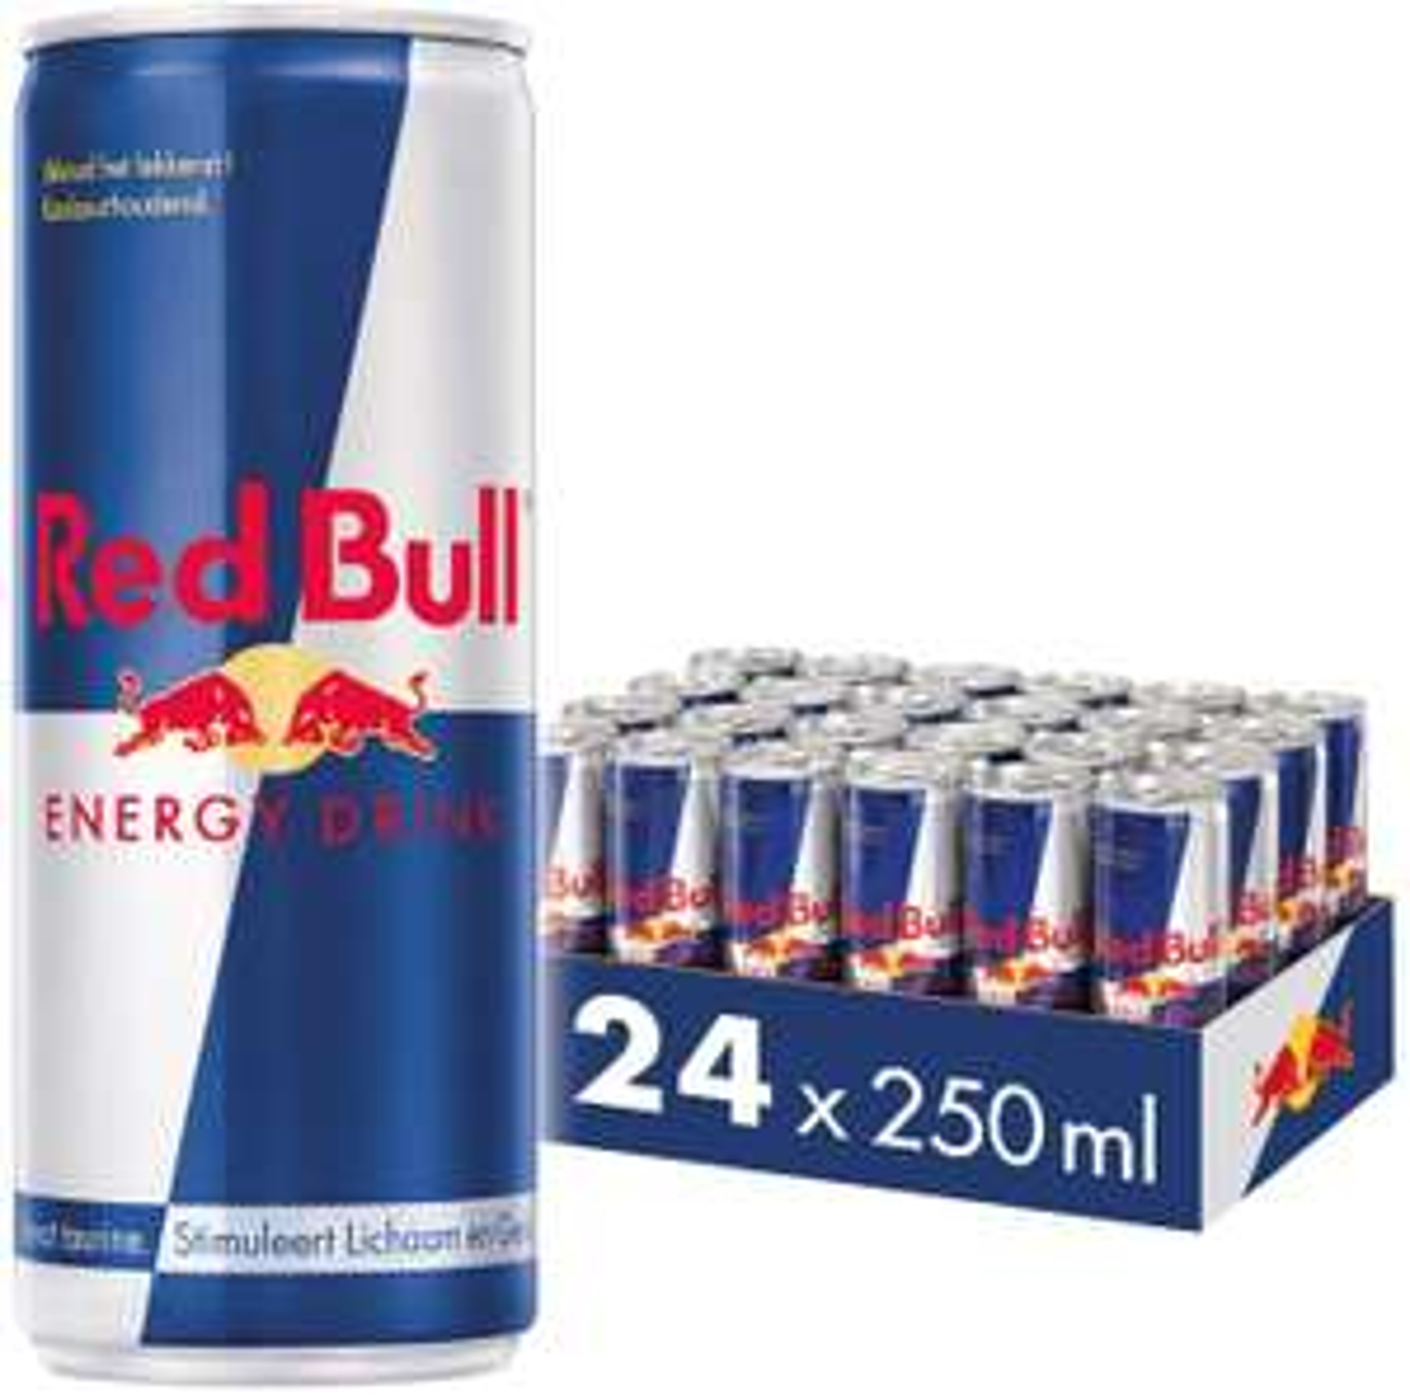 Prime days - Red Bull voor ongeveer 1 euro per stuk (24*250ml)